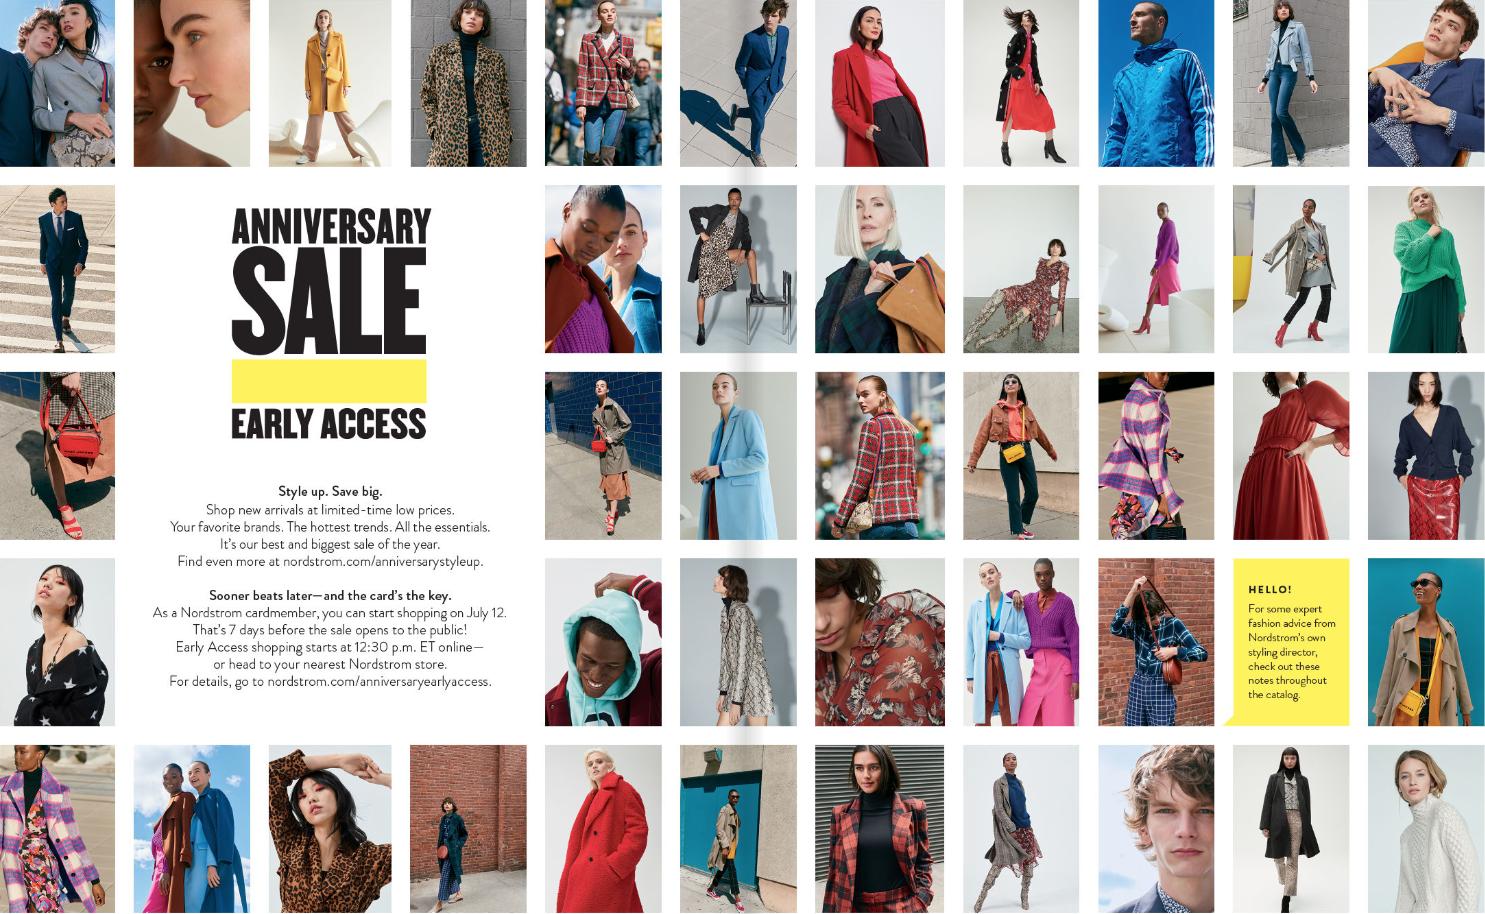 Nordstrom Anniversary Sale Catalog 2019